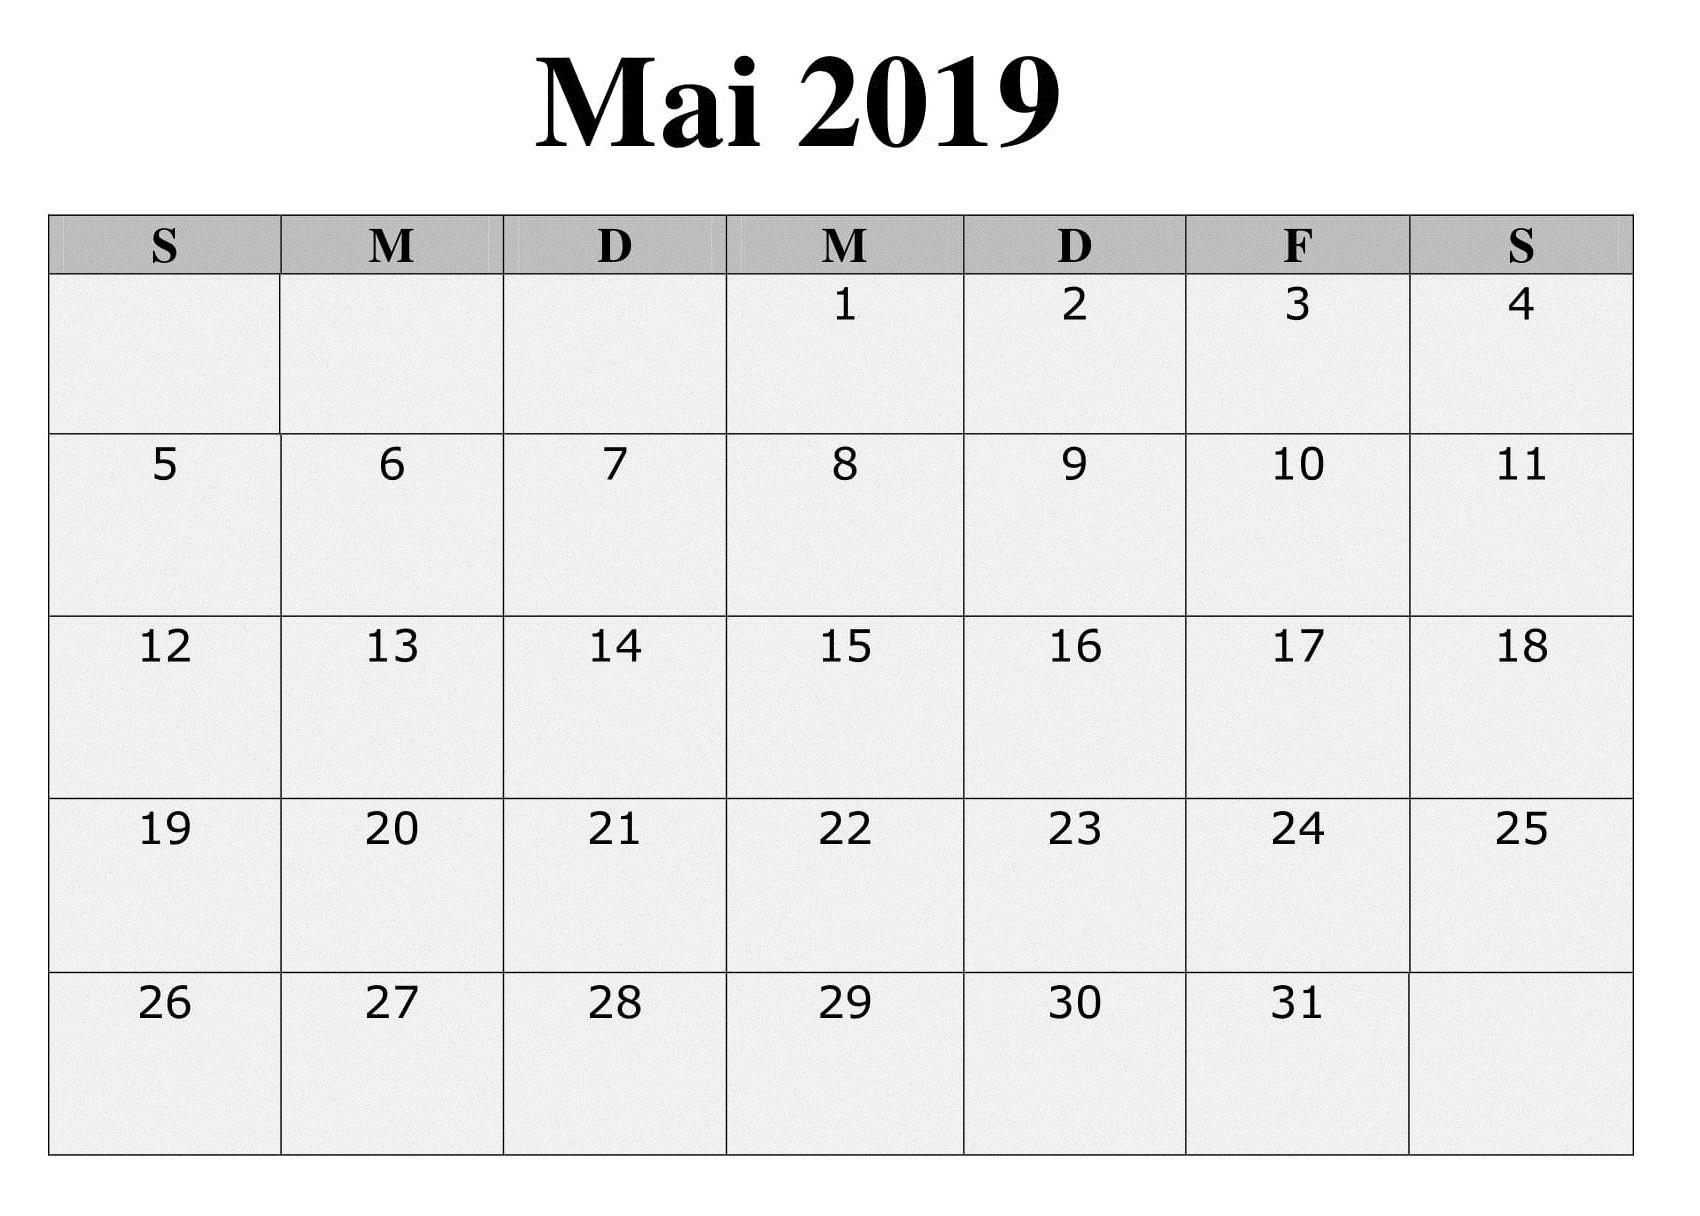 Calendario 2019 Imprimir A4 Más Populares 2019 Kalender Mai Zum Ausdrucken Planer Of Calendario 2019 Imprimir A4 Más Caliente Details